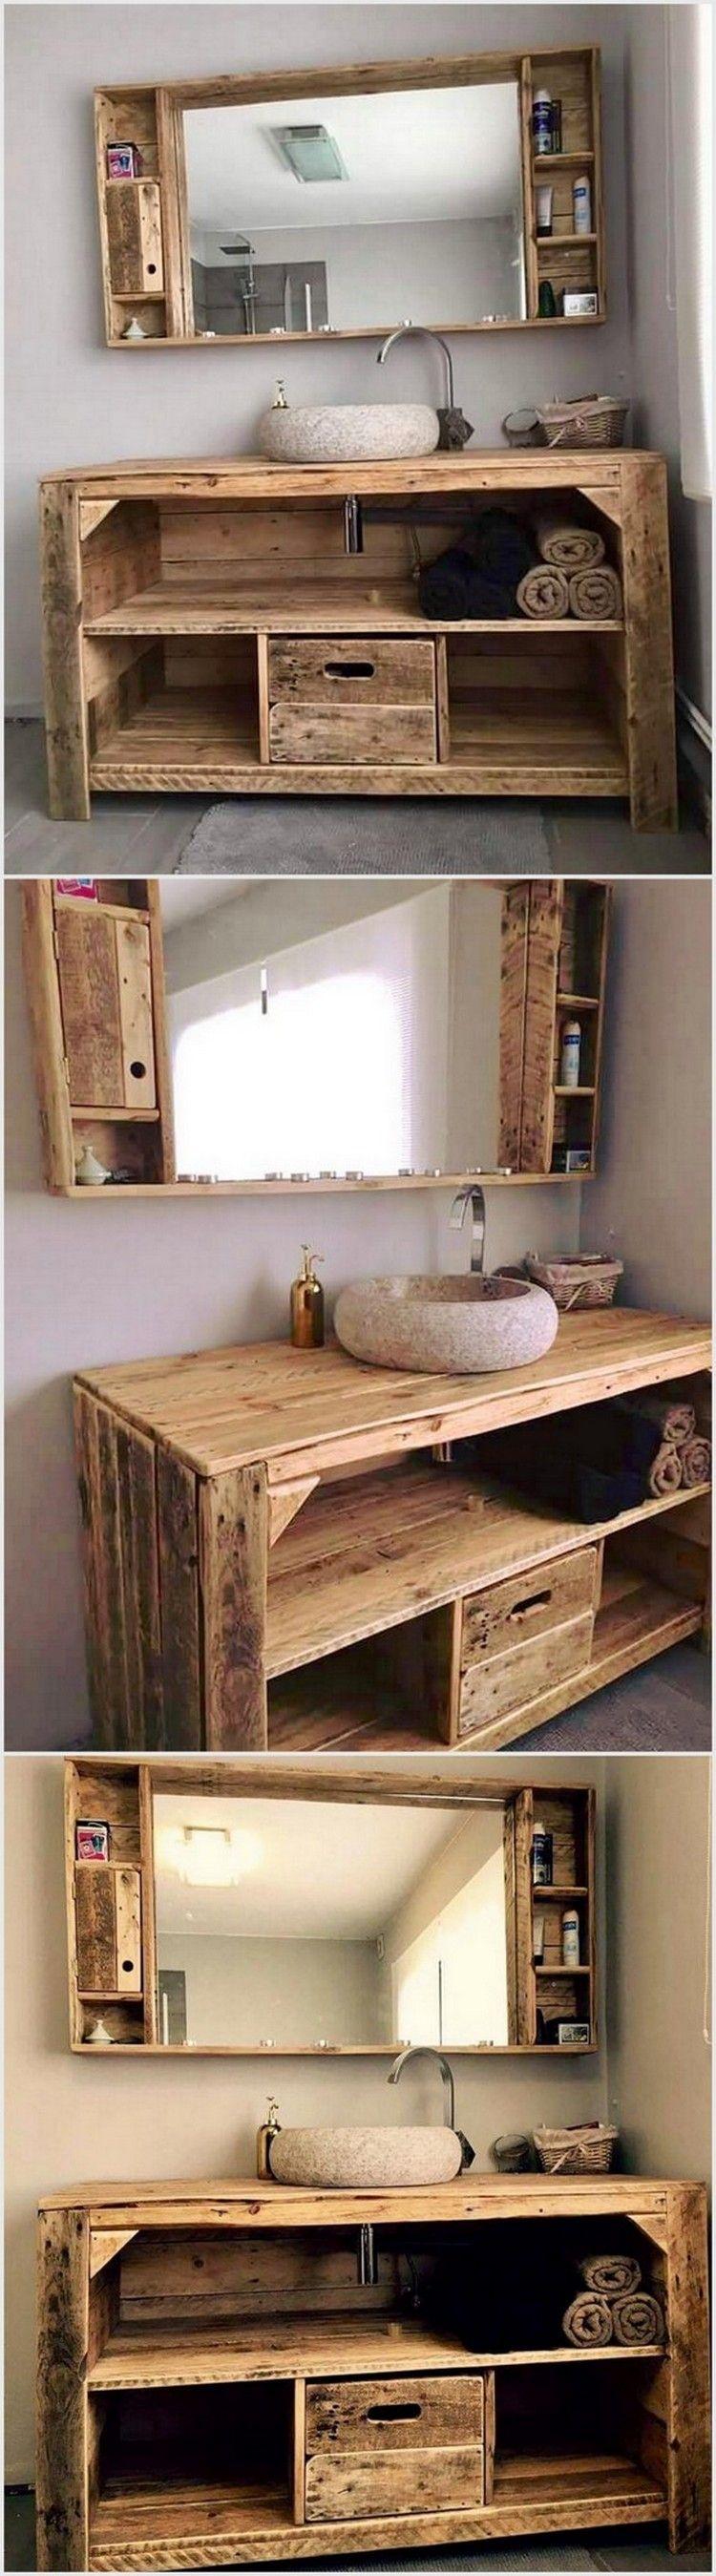 We Have Created This Awesome Pallet Wood Creation For Bathroom You Can Place This Furn Decoration Salle De Bain Salle De Bains Palette Meuble De Salle De Bain